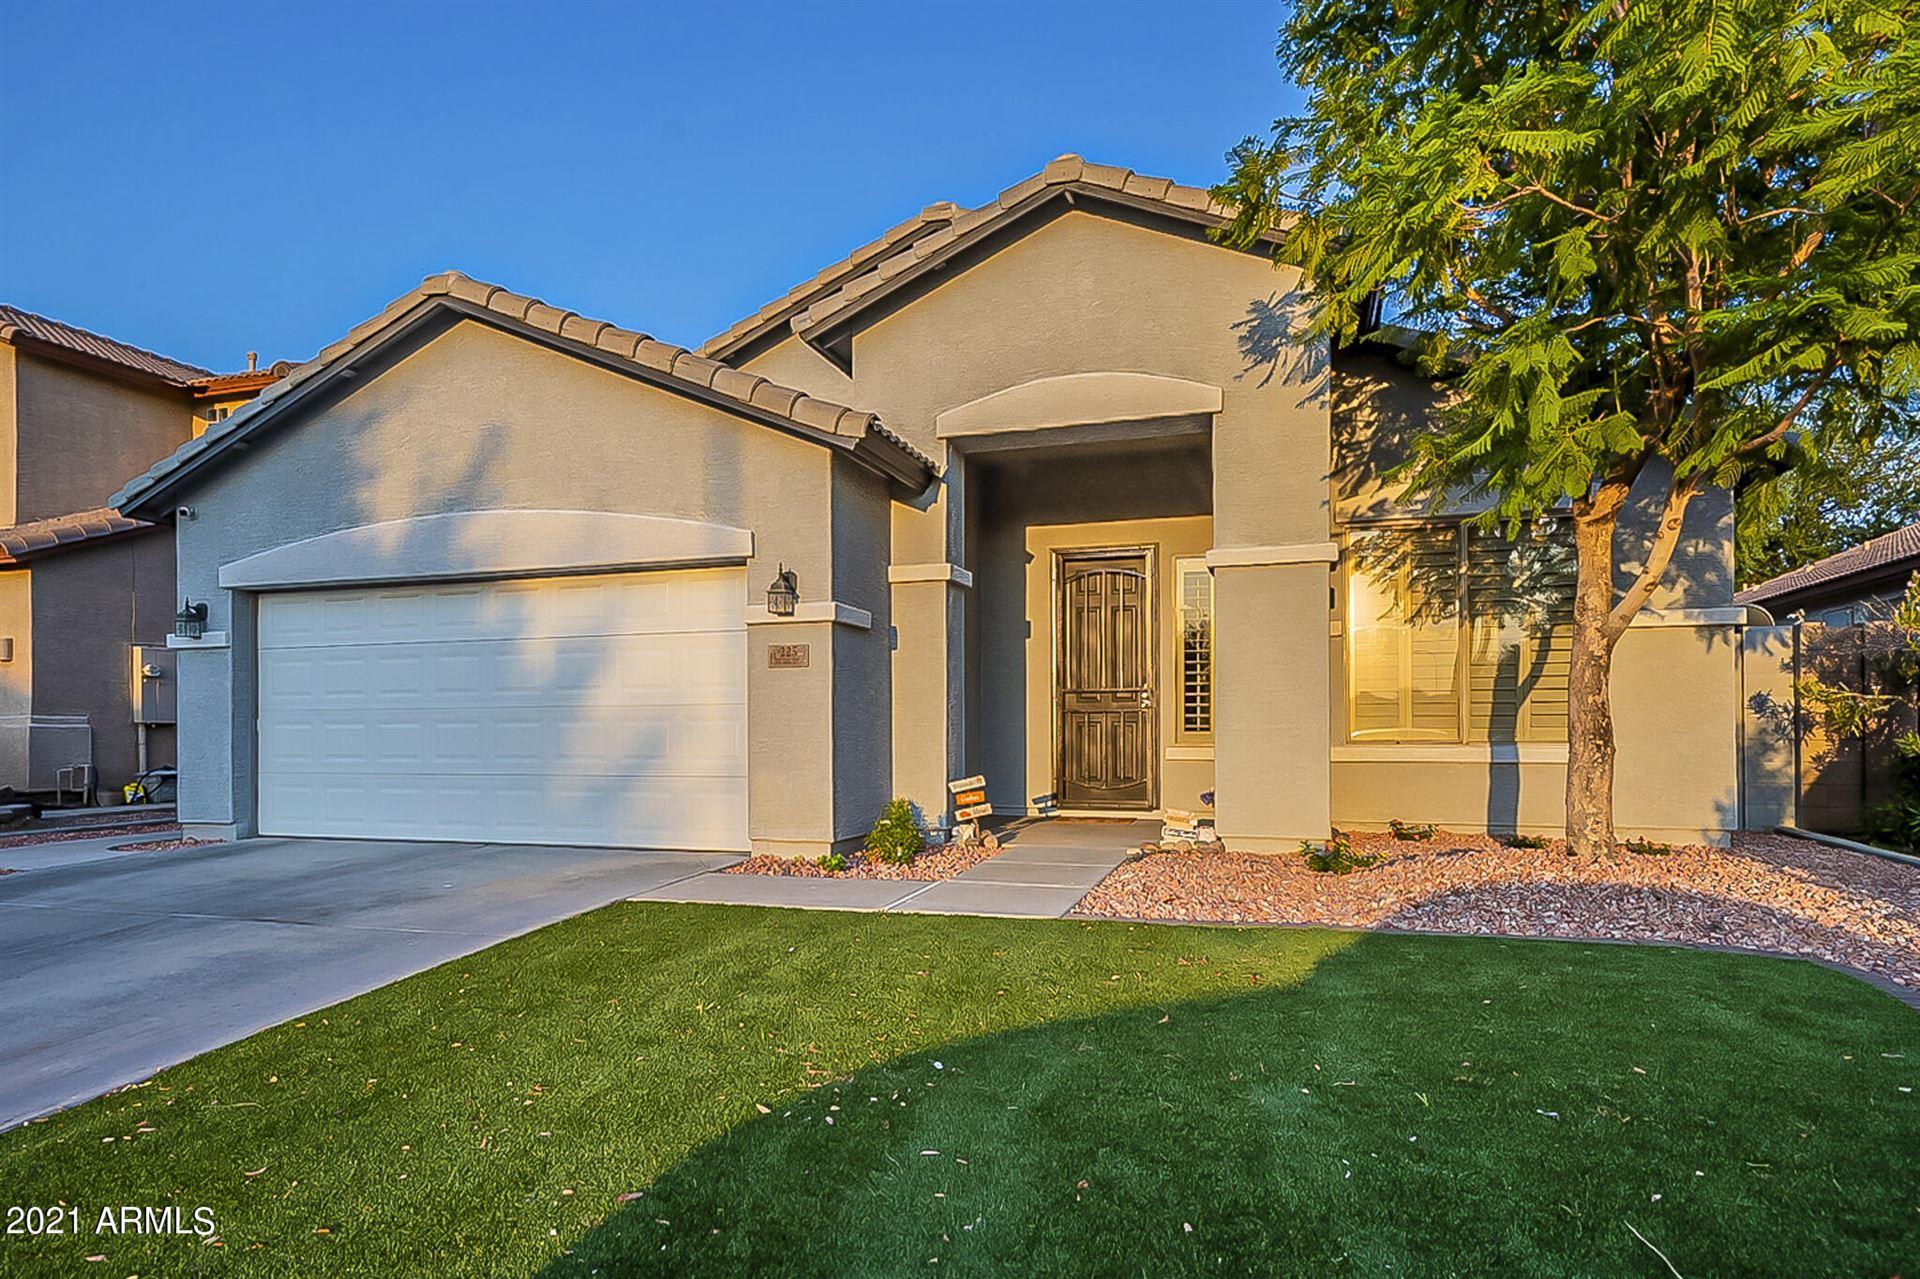 Photo of 225 S 123RD Drive, Avondale, AZ 85323 (MLS # 6294071)